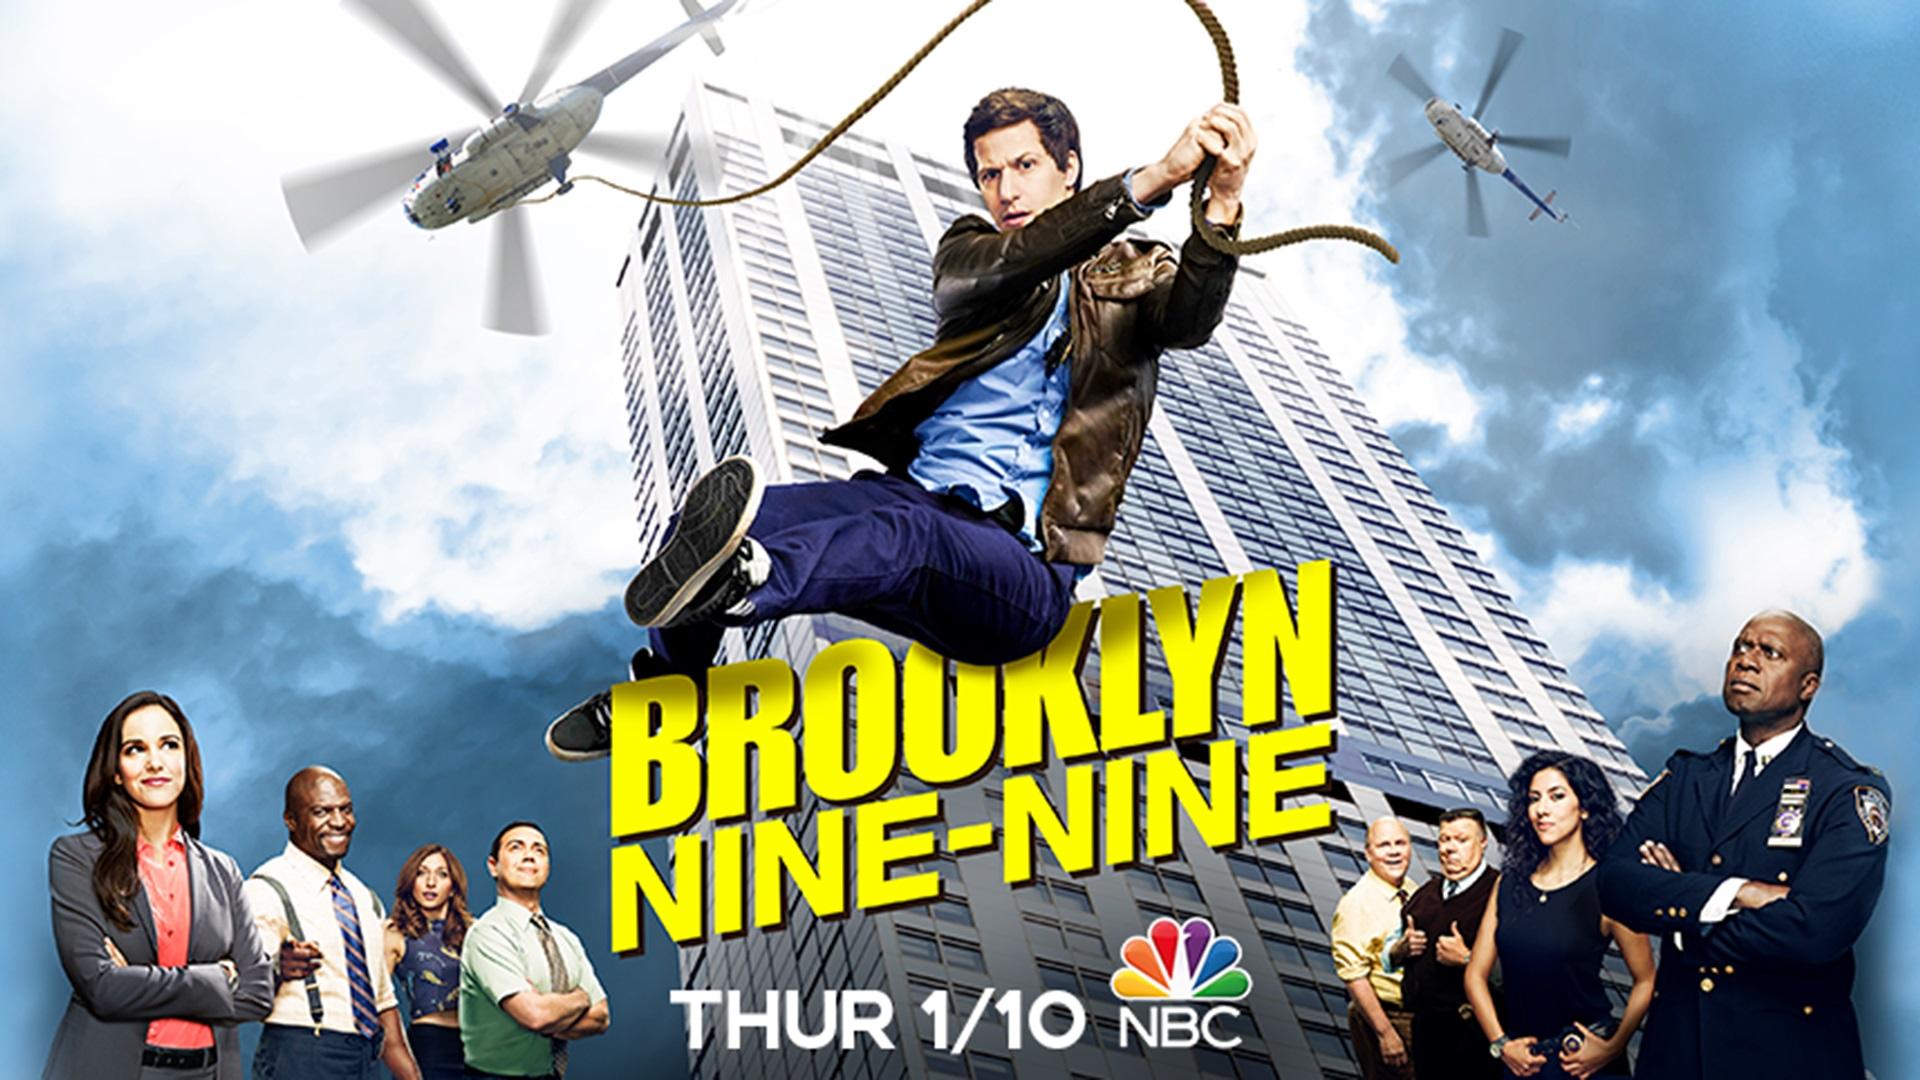 Brooklyn Nine-Nine Season 4 Poster Features Squad